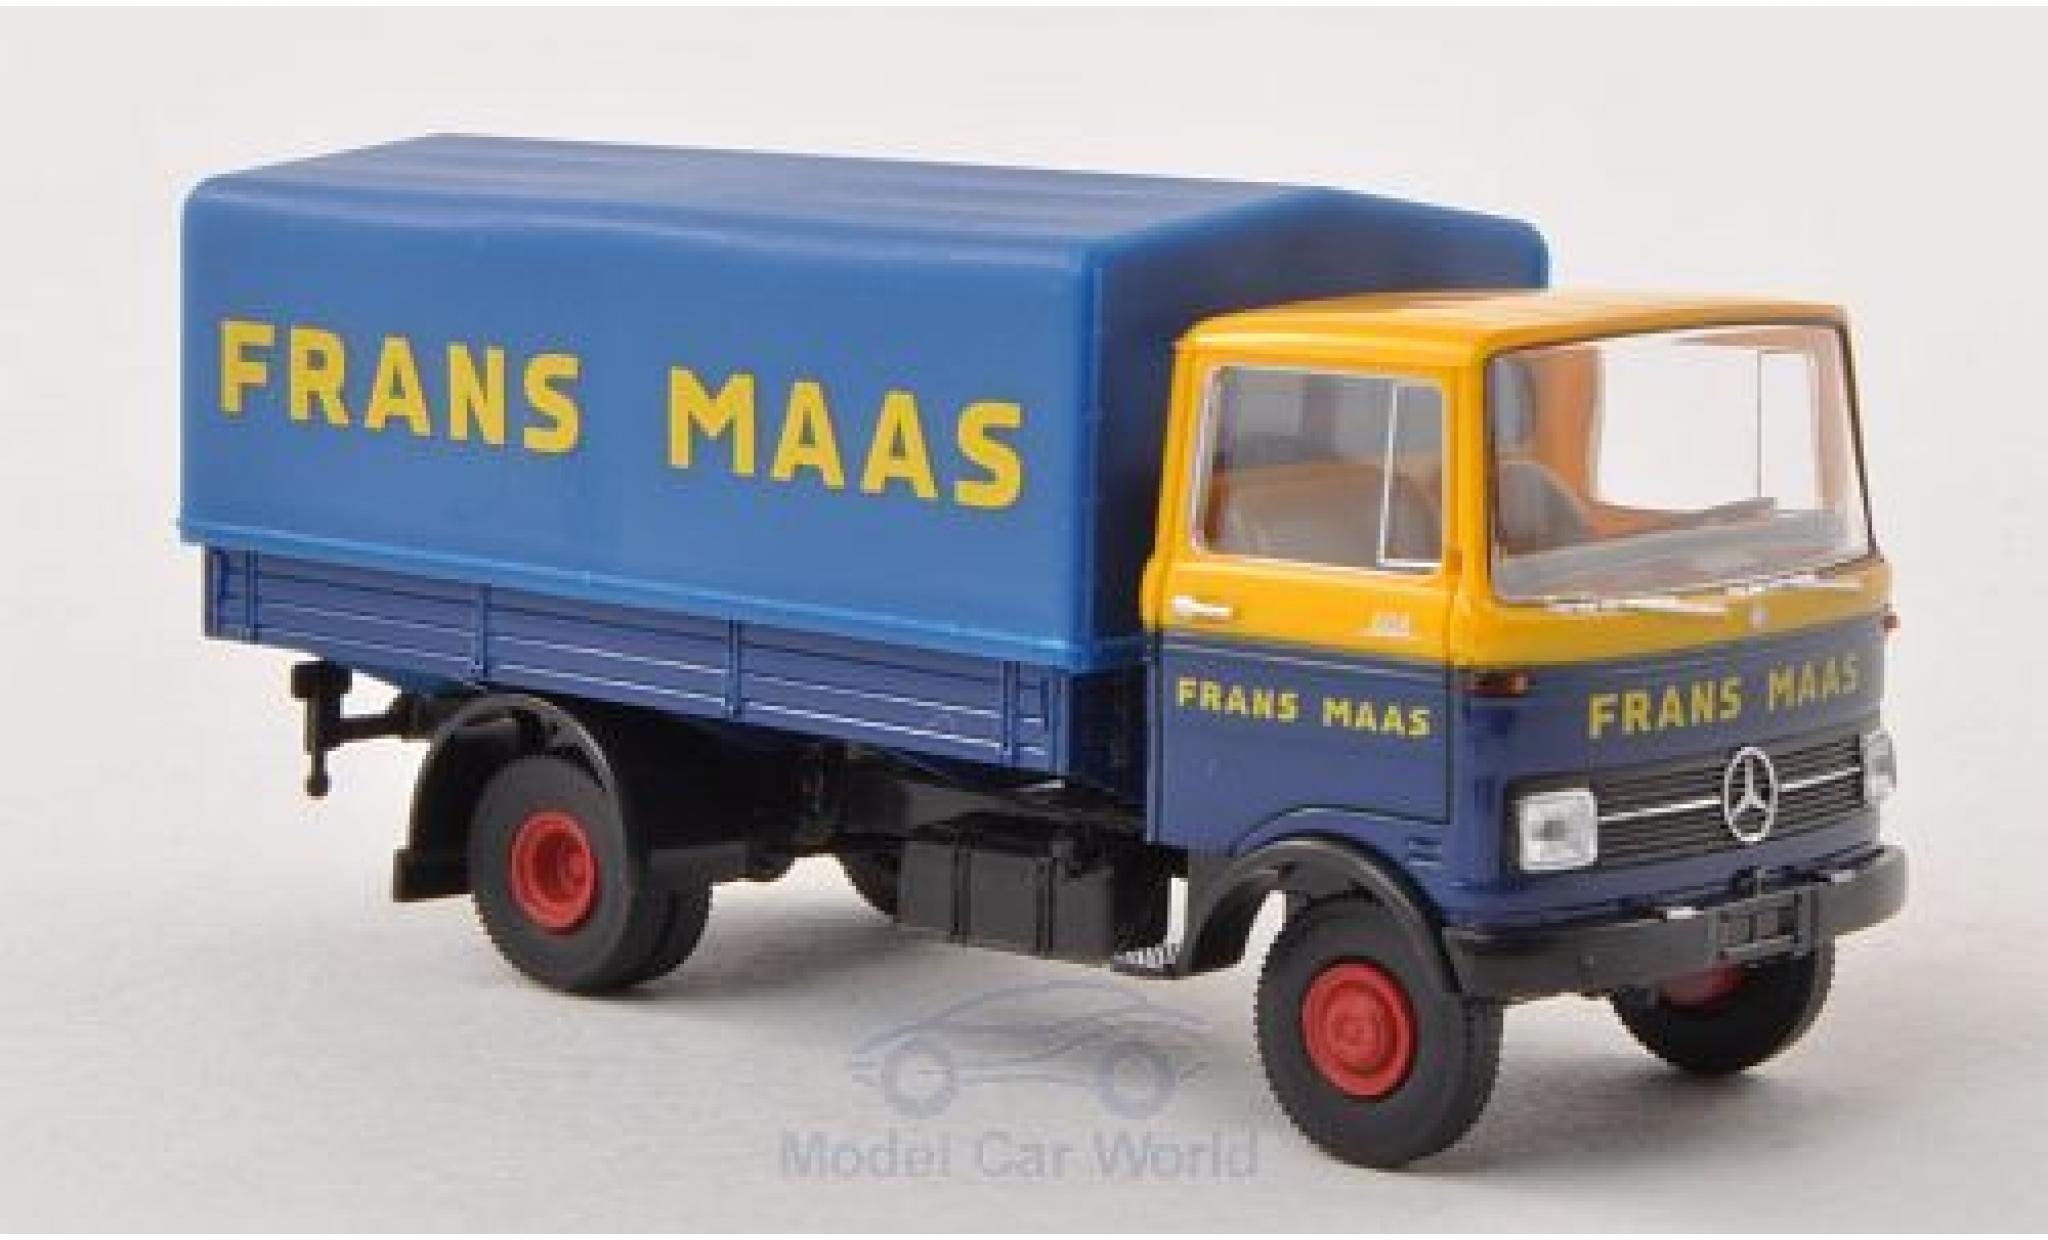 Mercedes LP 608 1/87 Brekina Pritsche Frans Maas (NL)